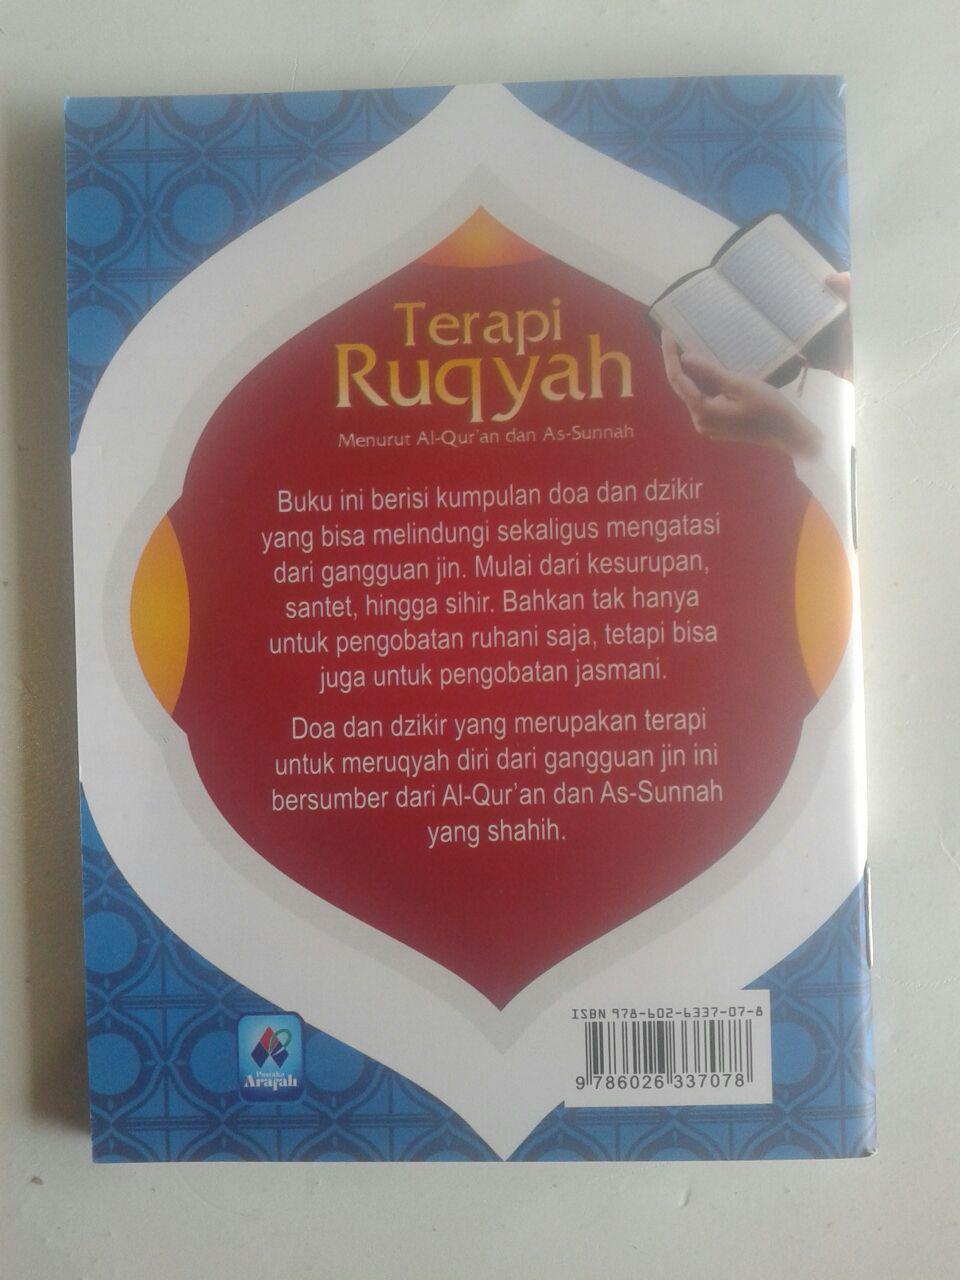 Buku Saku Terapi Ruqyah Menurut Al-Qur'an Dan As-Sunnah cover